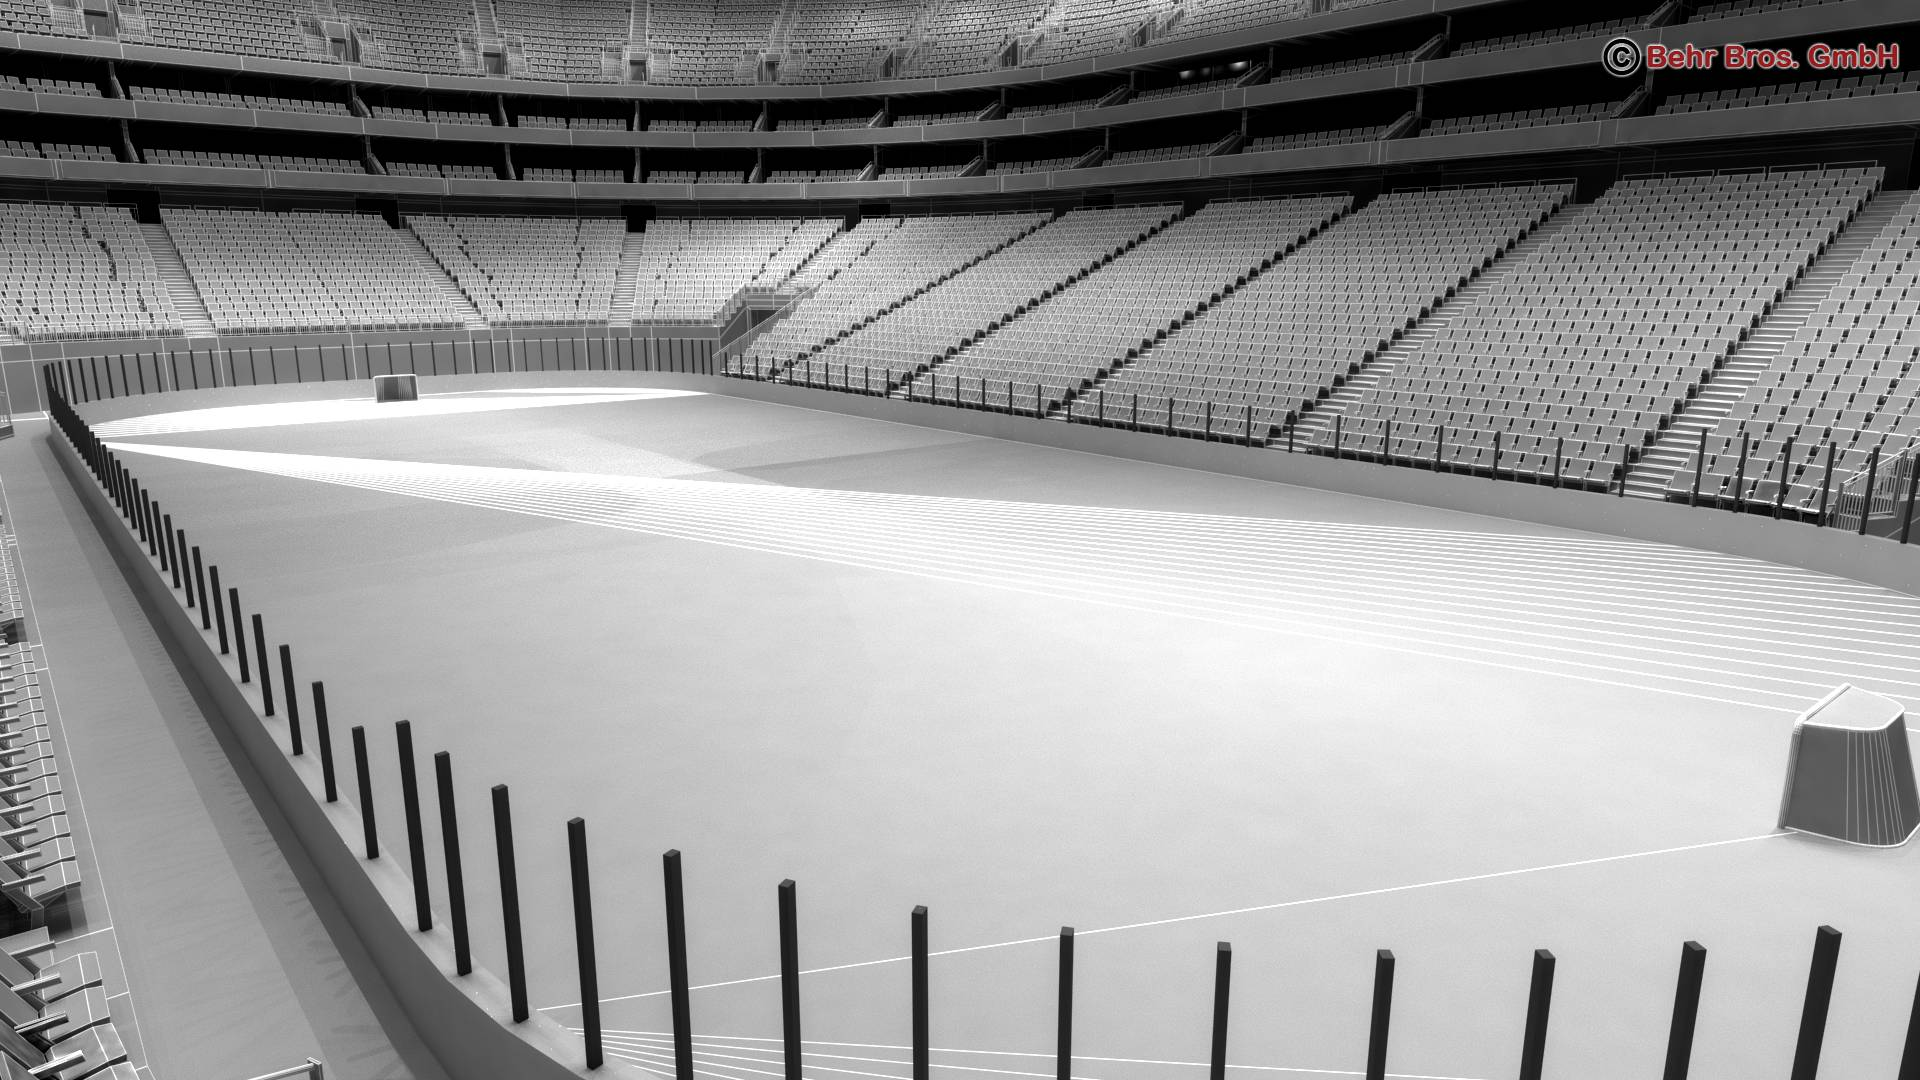 мөсөн хоккейн талбай V2 3d загвар 3ds max fbx c4d 251662